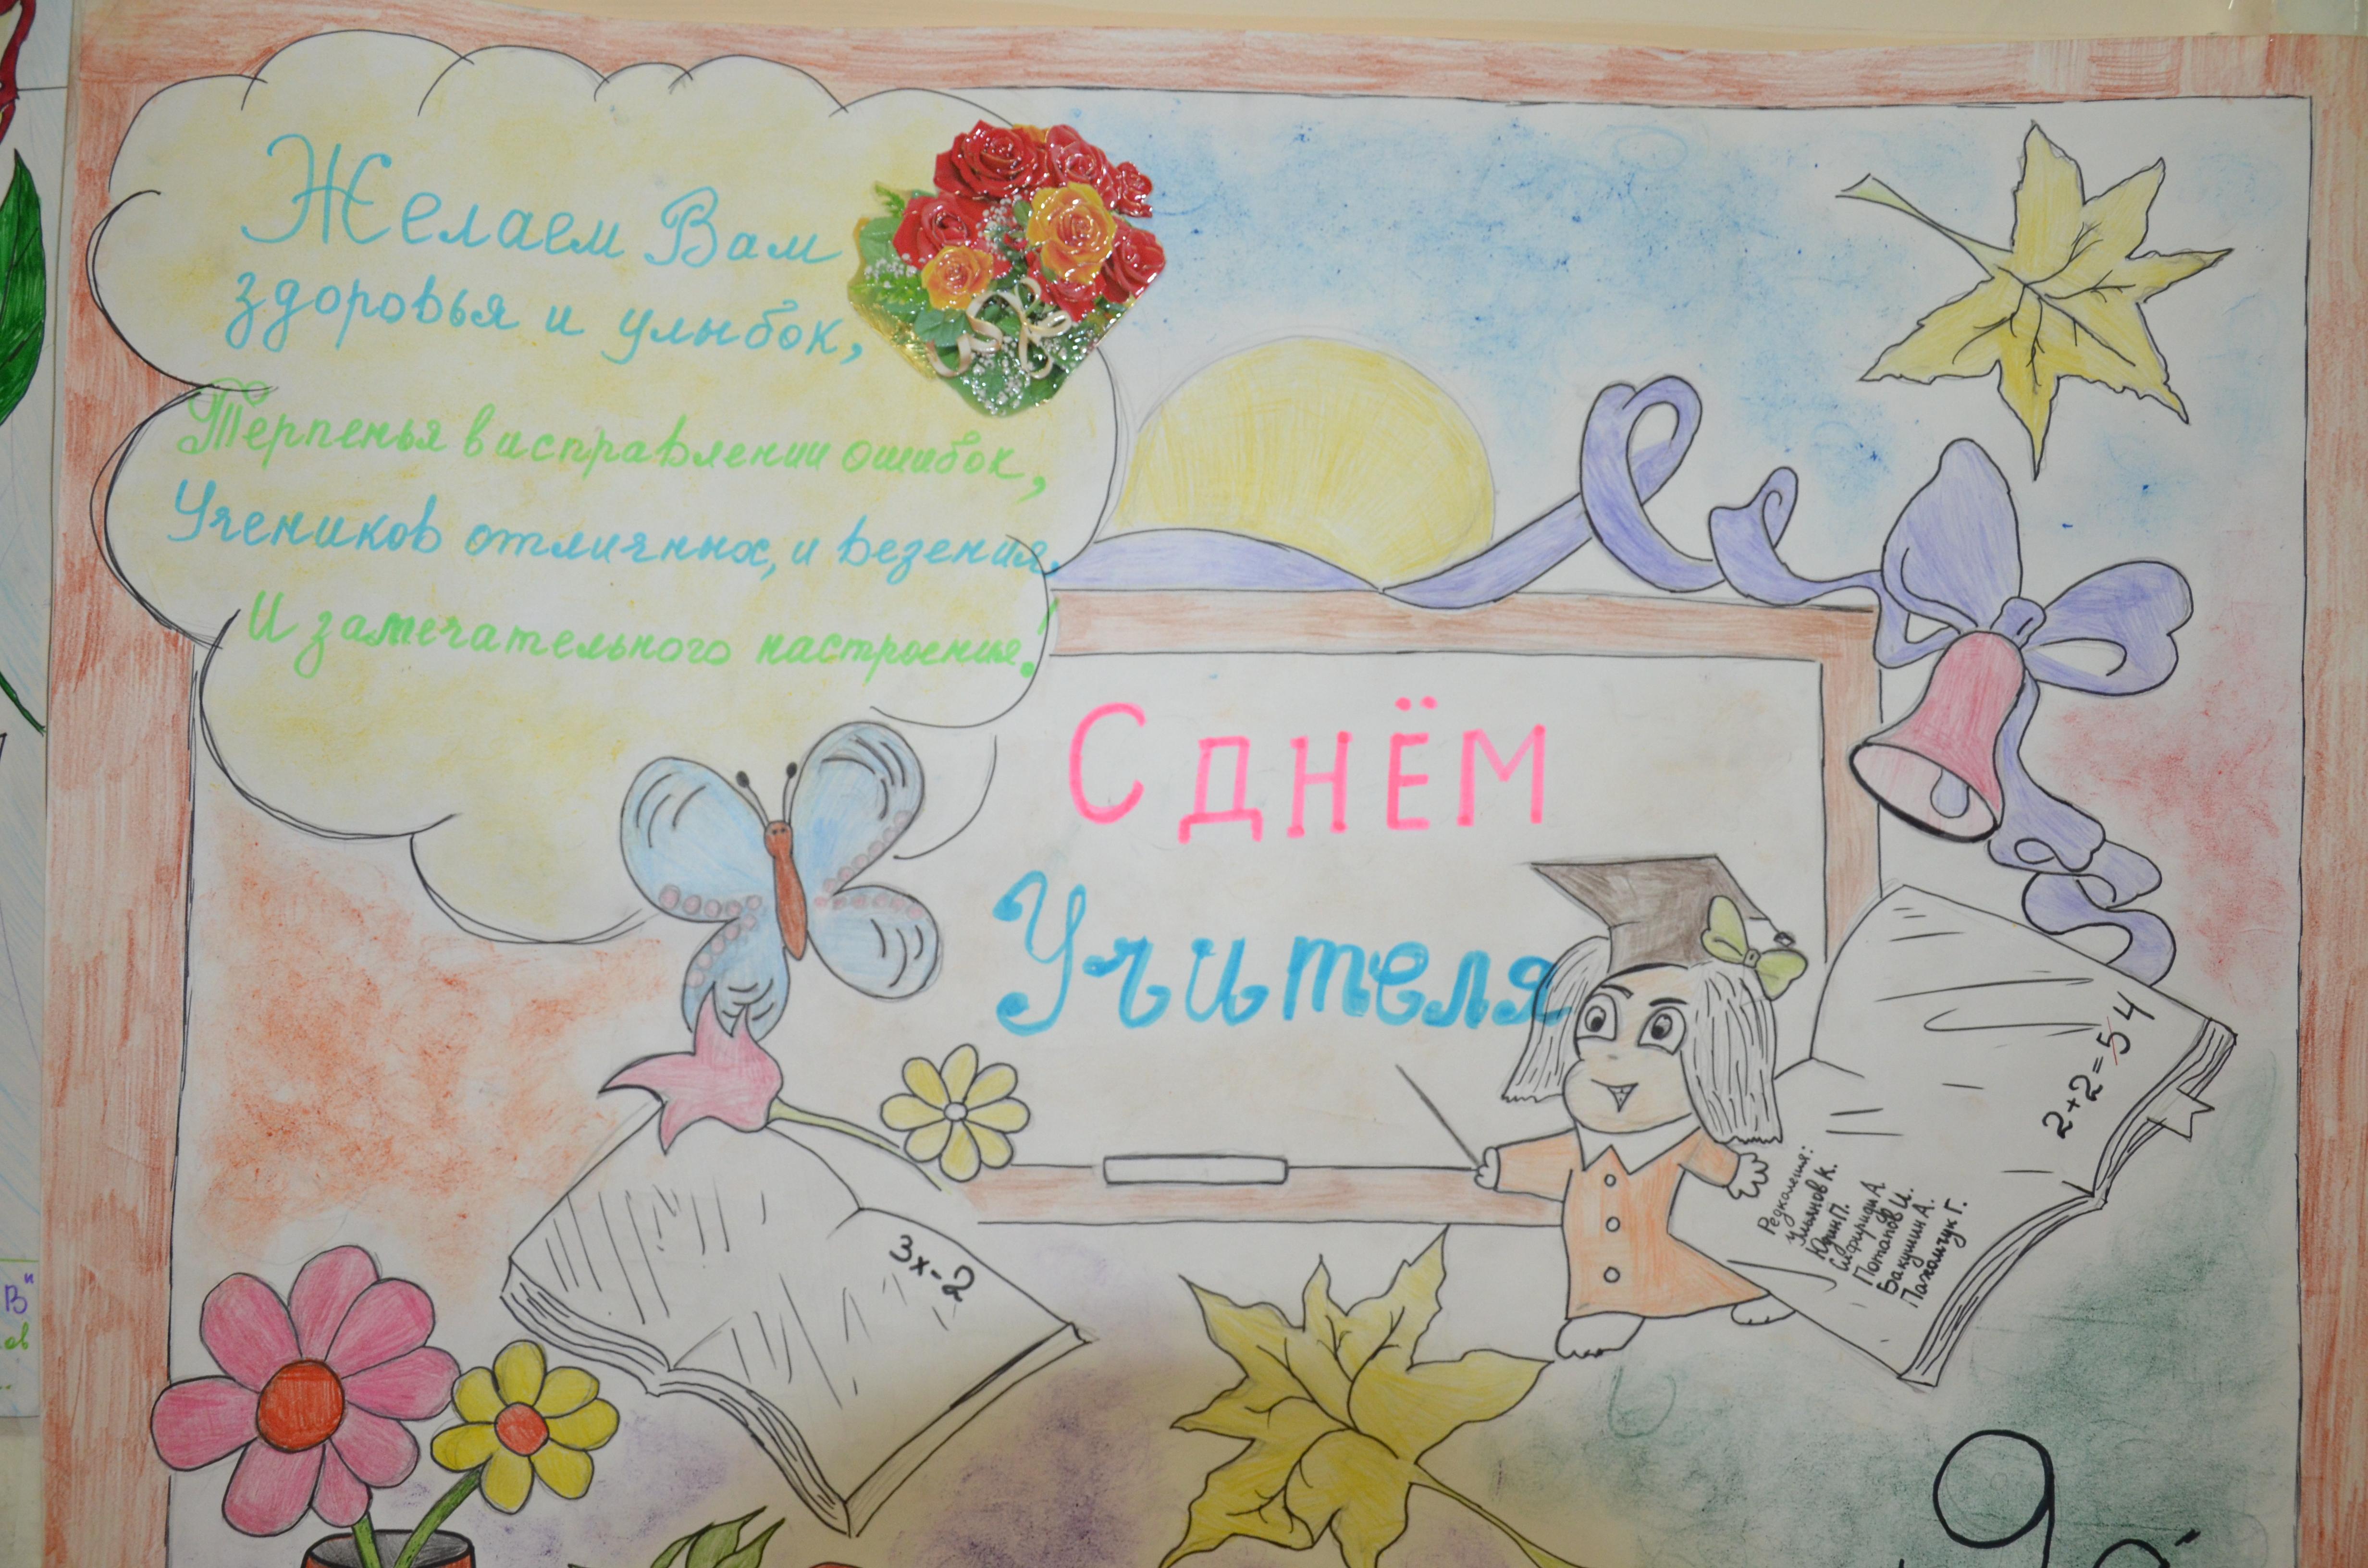 Картинки и плакаты на день учителя, картинки